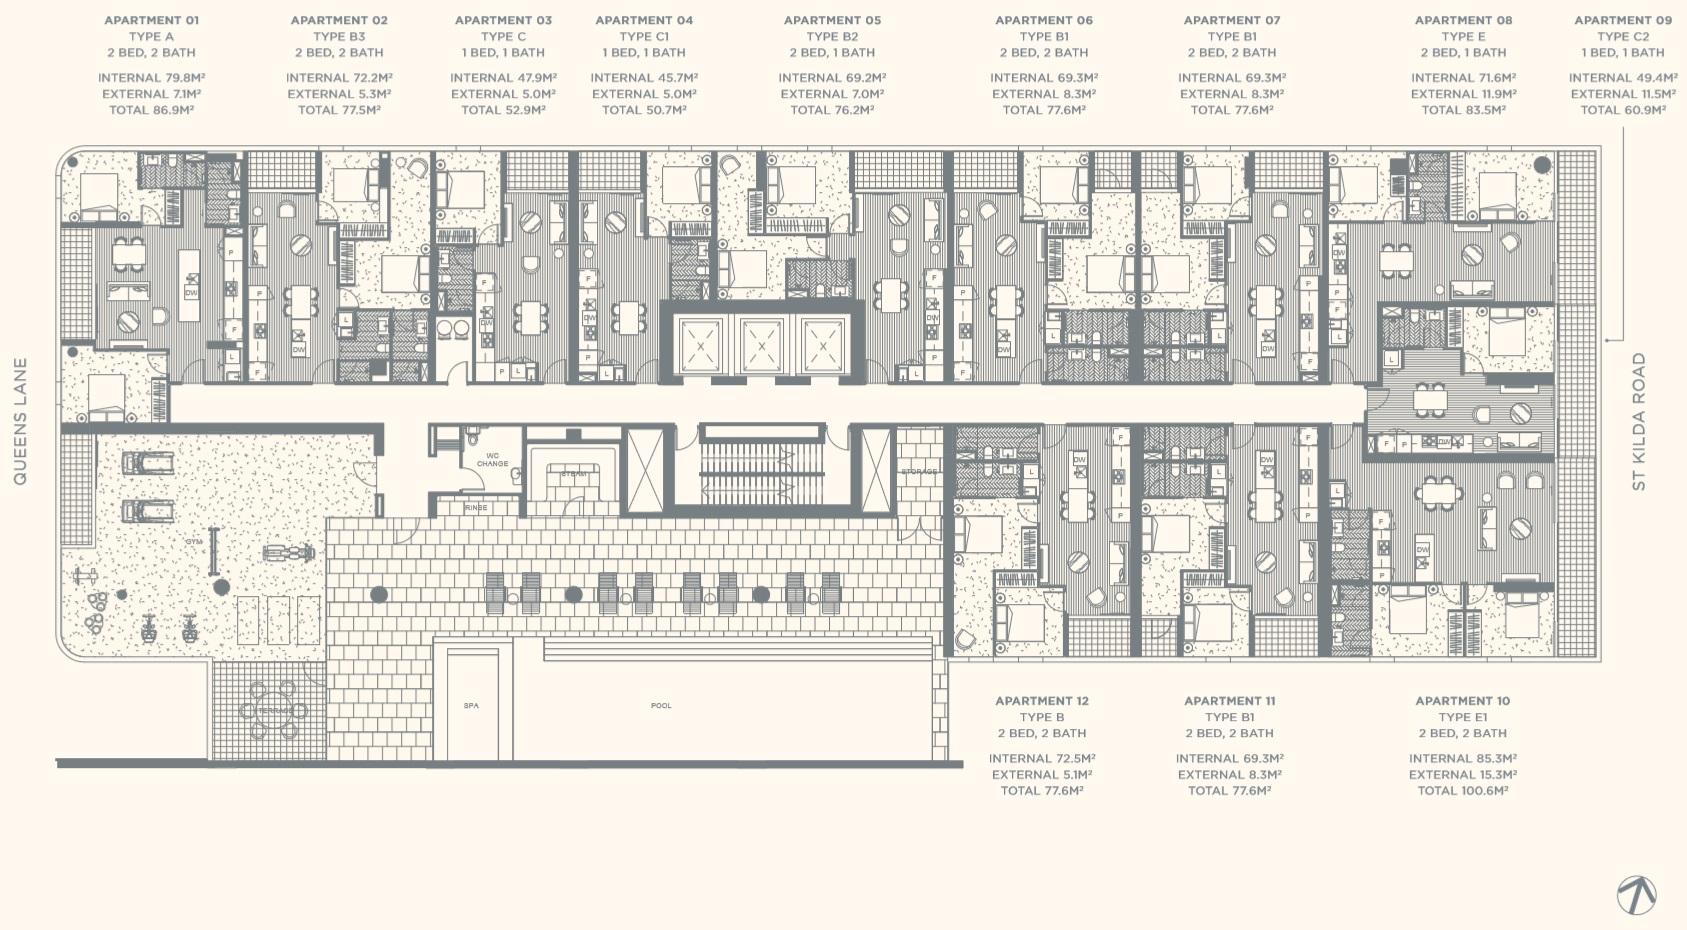 Floor Plate Level 01